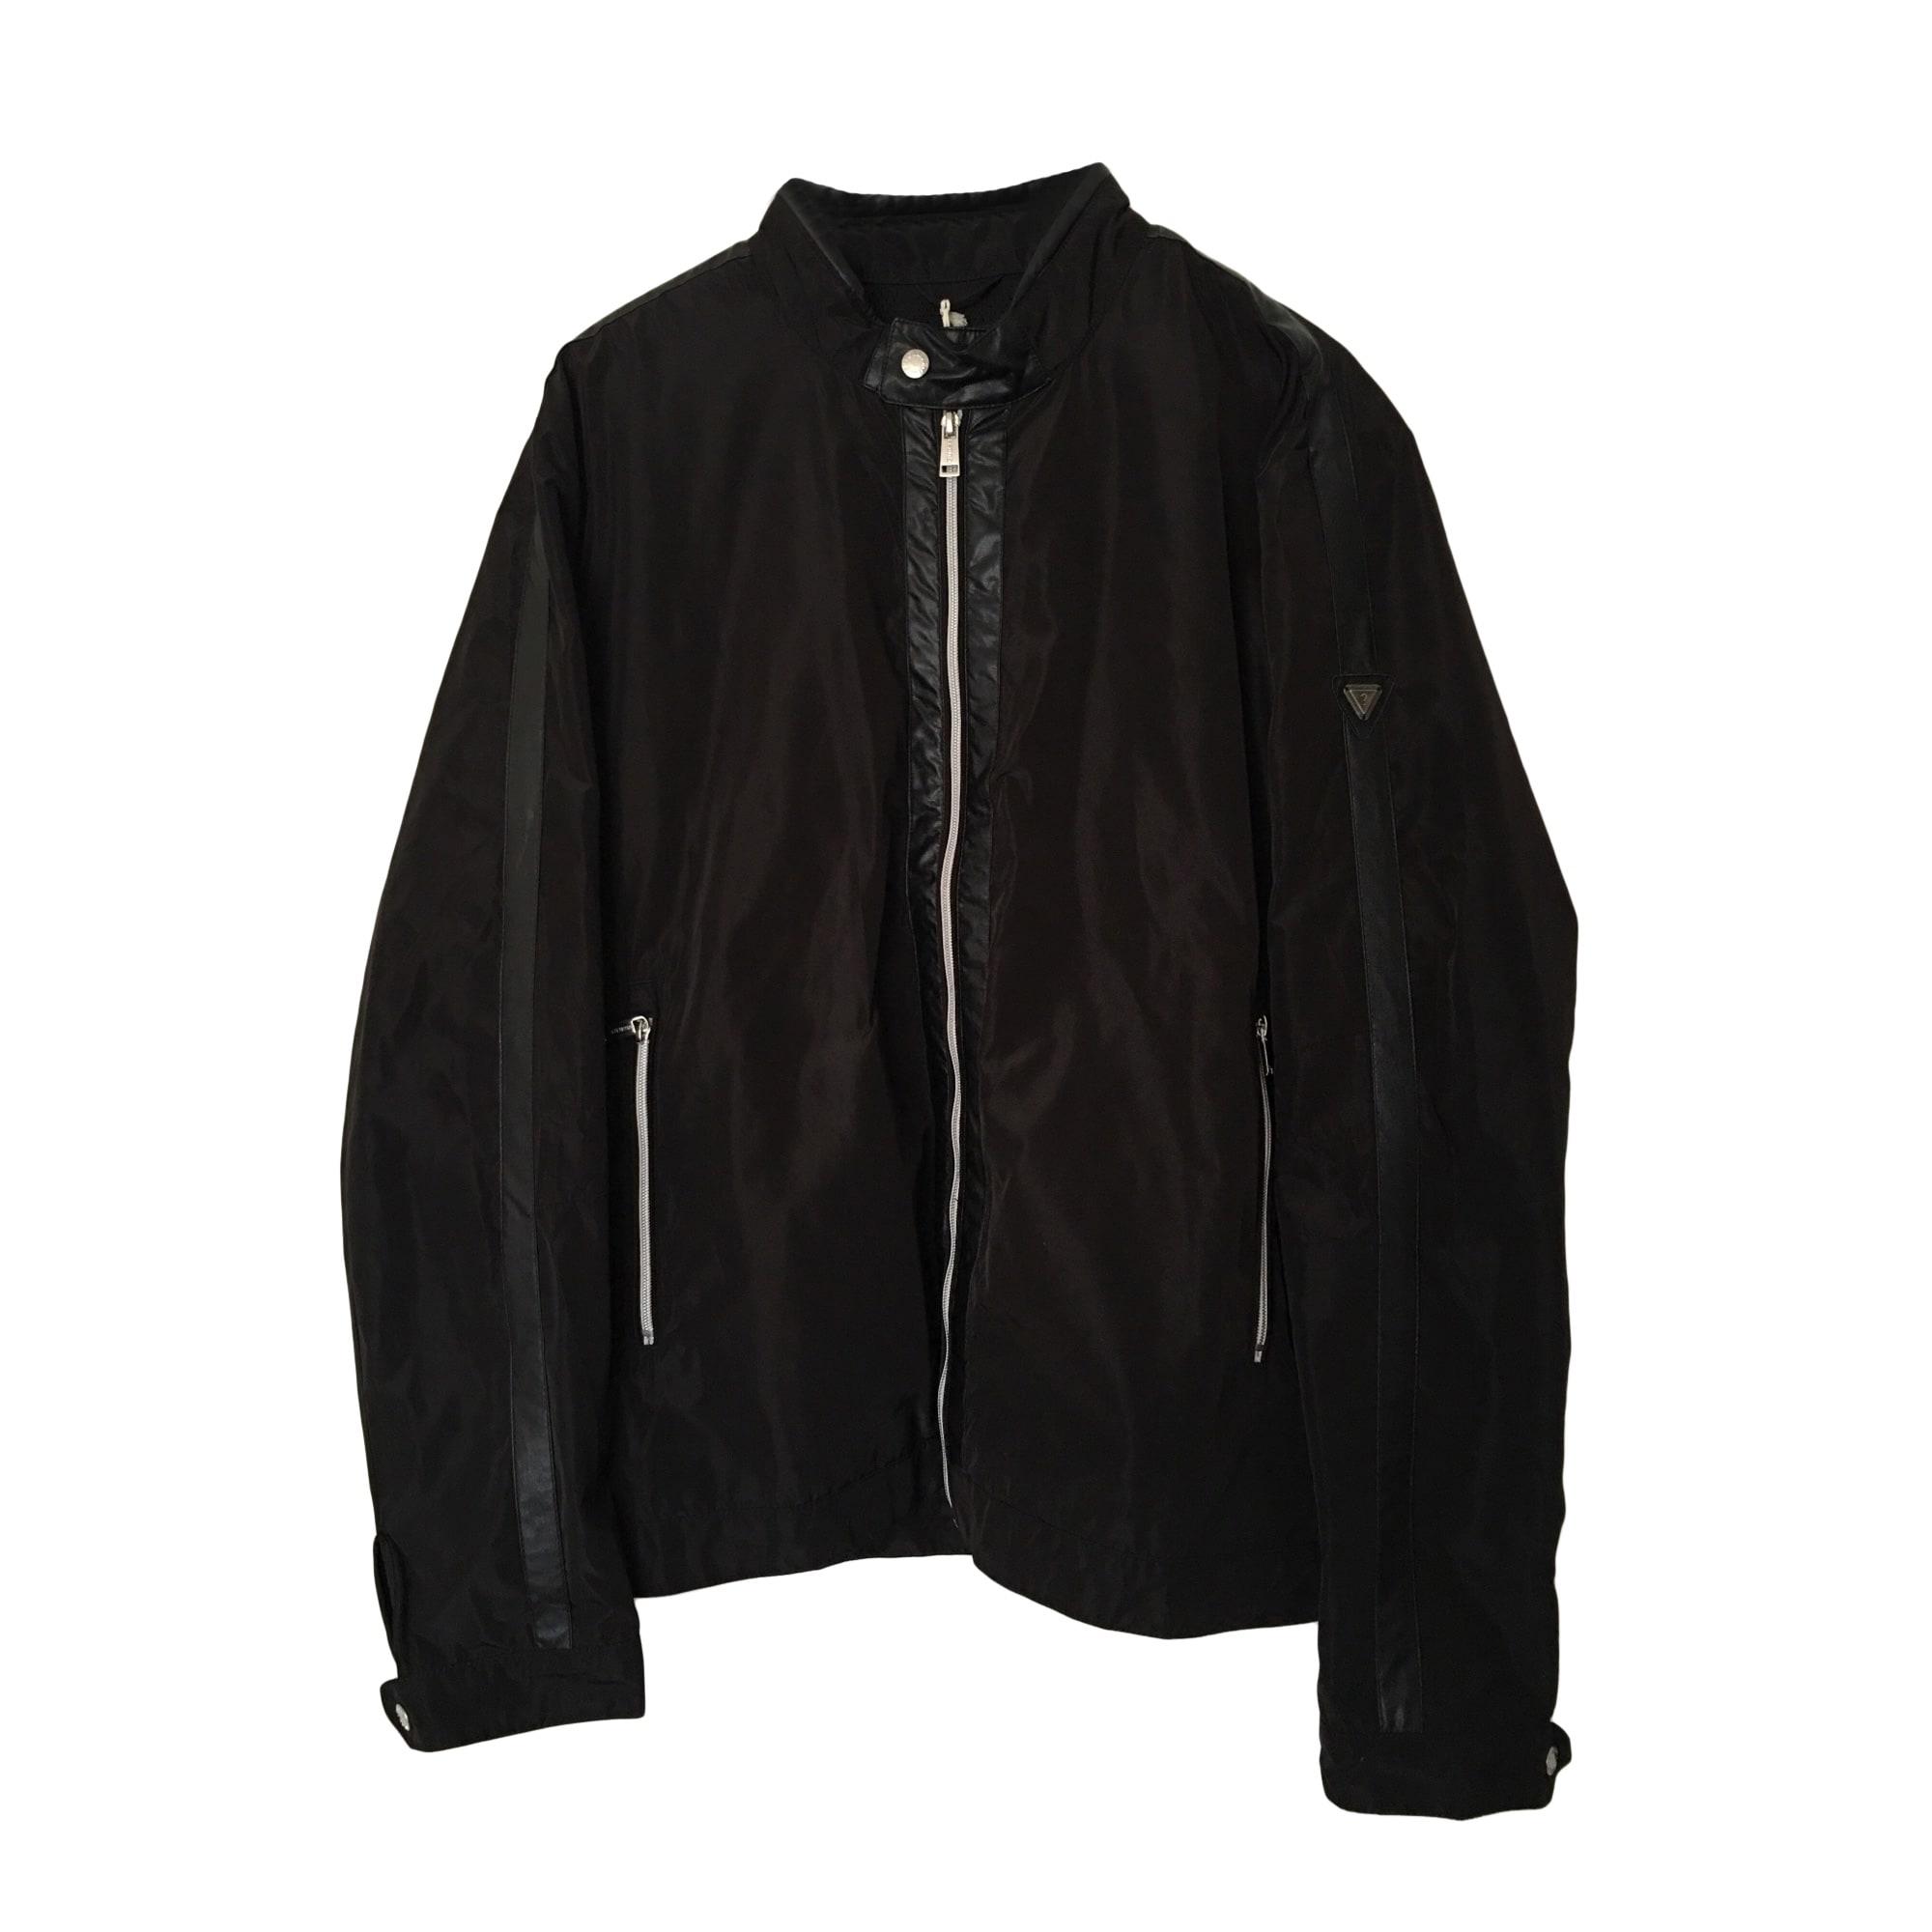 Zipped Jacket GUESS Black